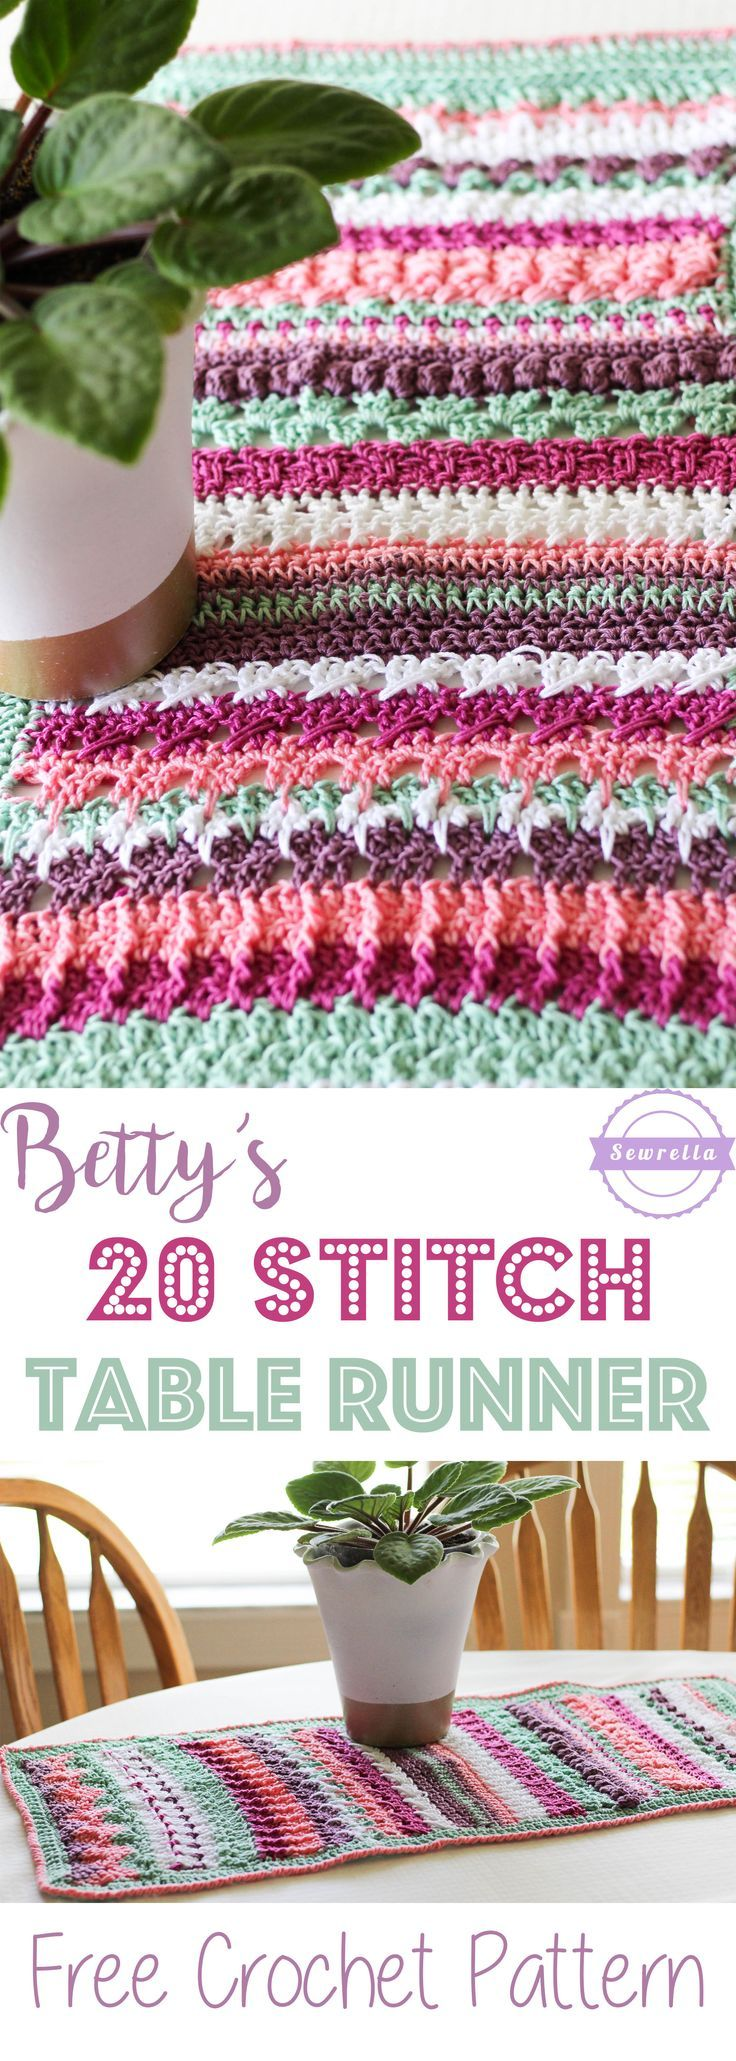 Betty's 20 Stitch Table Runner   Free Crochet Pattern from Sewrella